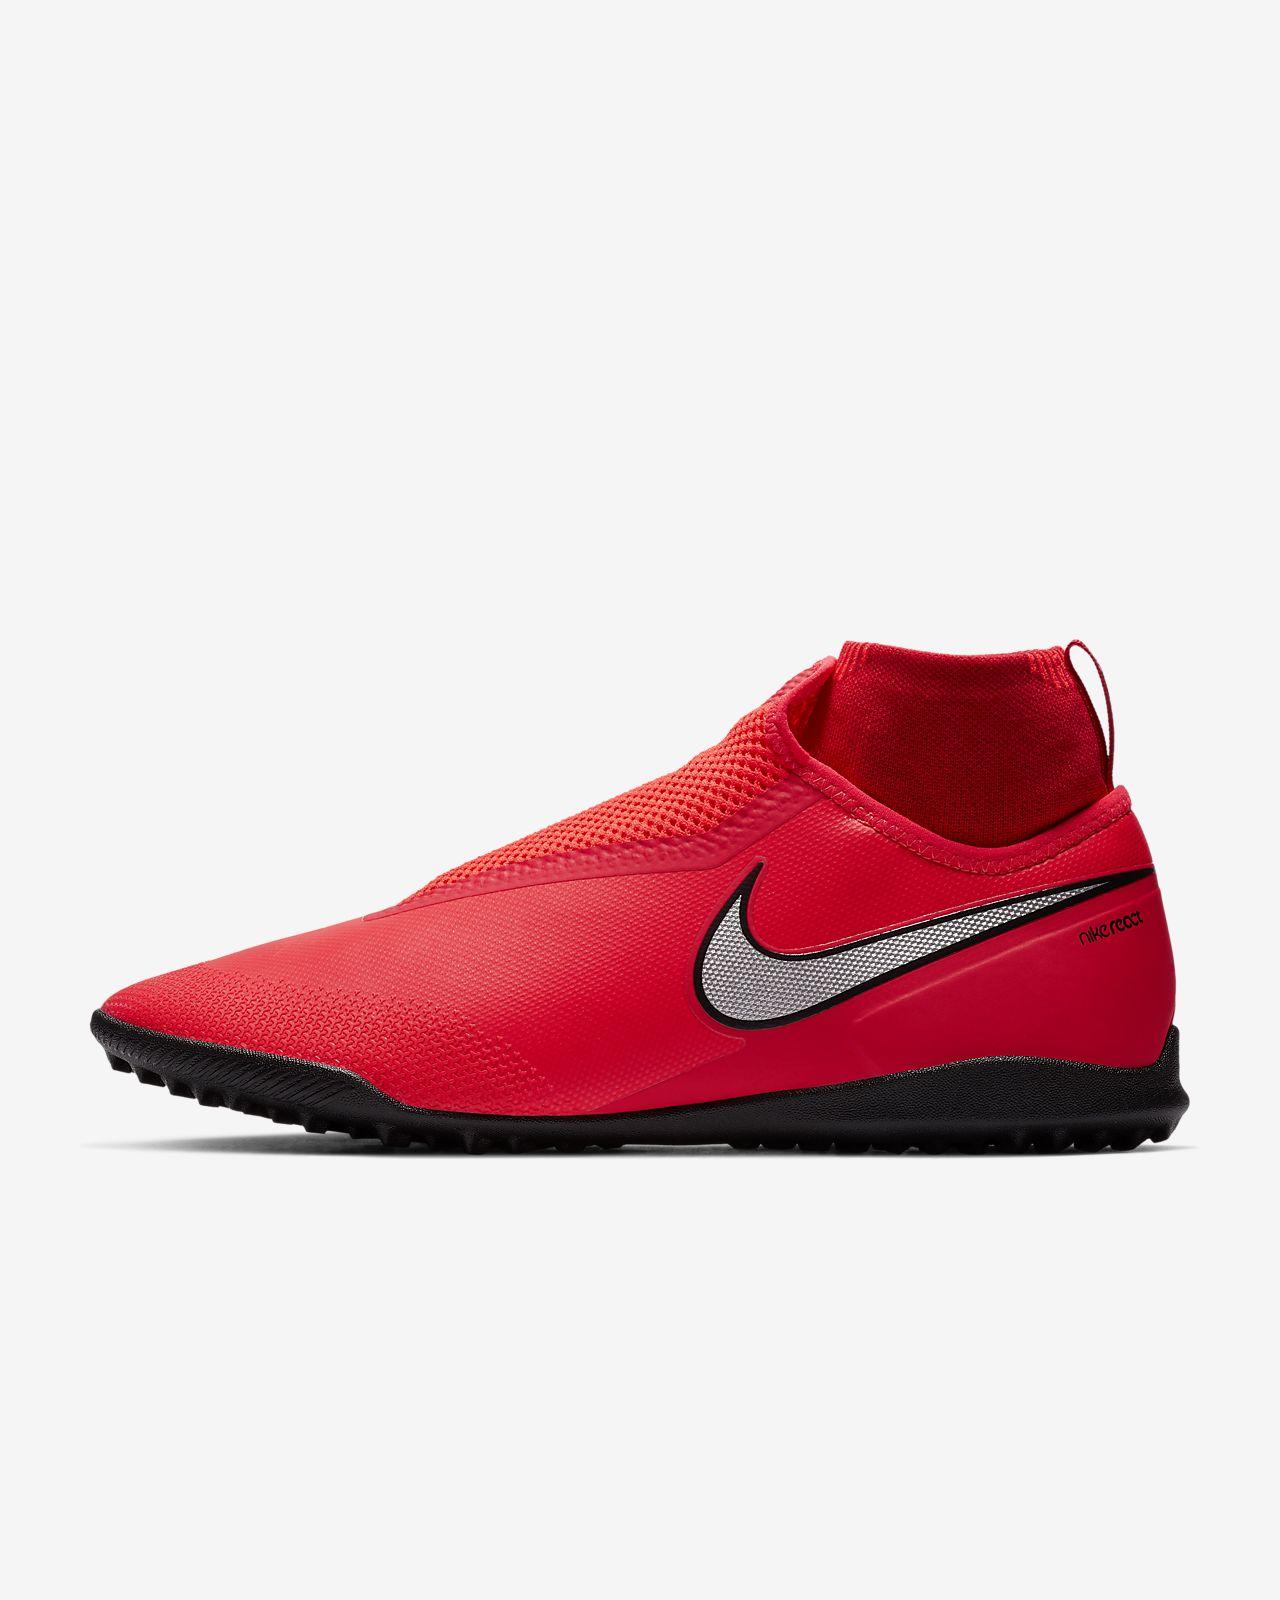 hot sale online 546c5 b690e ... Fotbollssko Nike React PhantomVSN Pro Dynamic Fit Game Over TF för grus turf